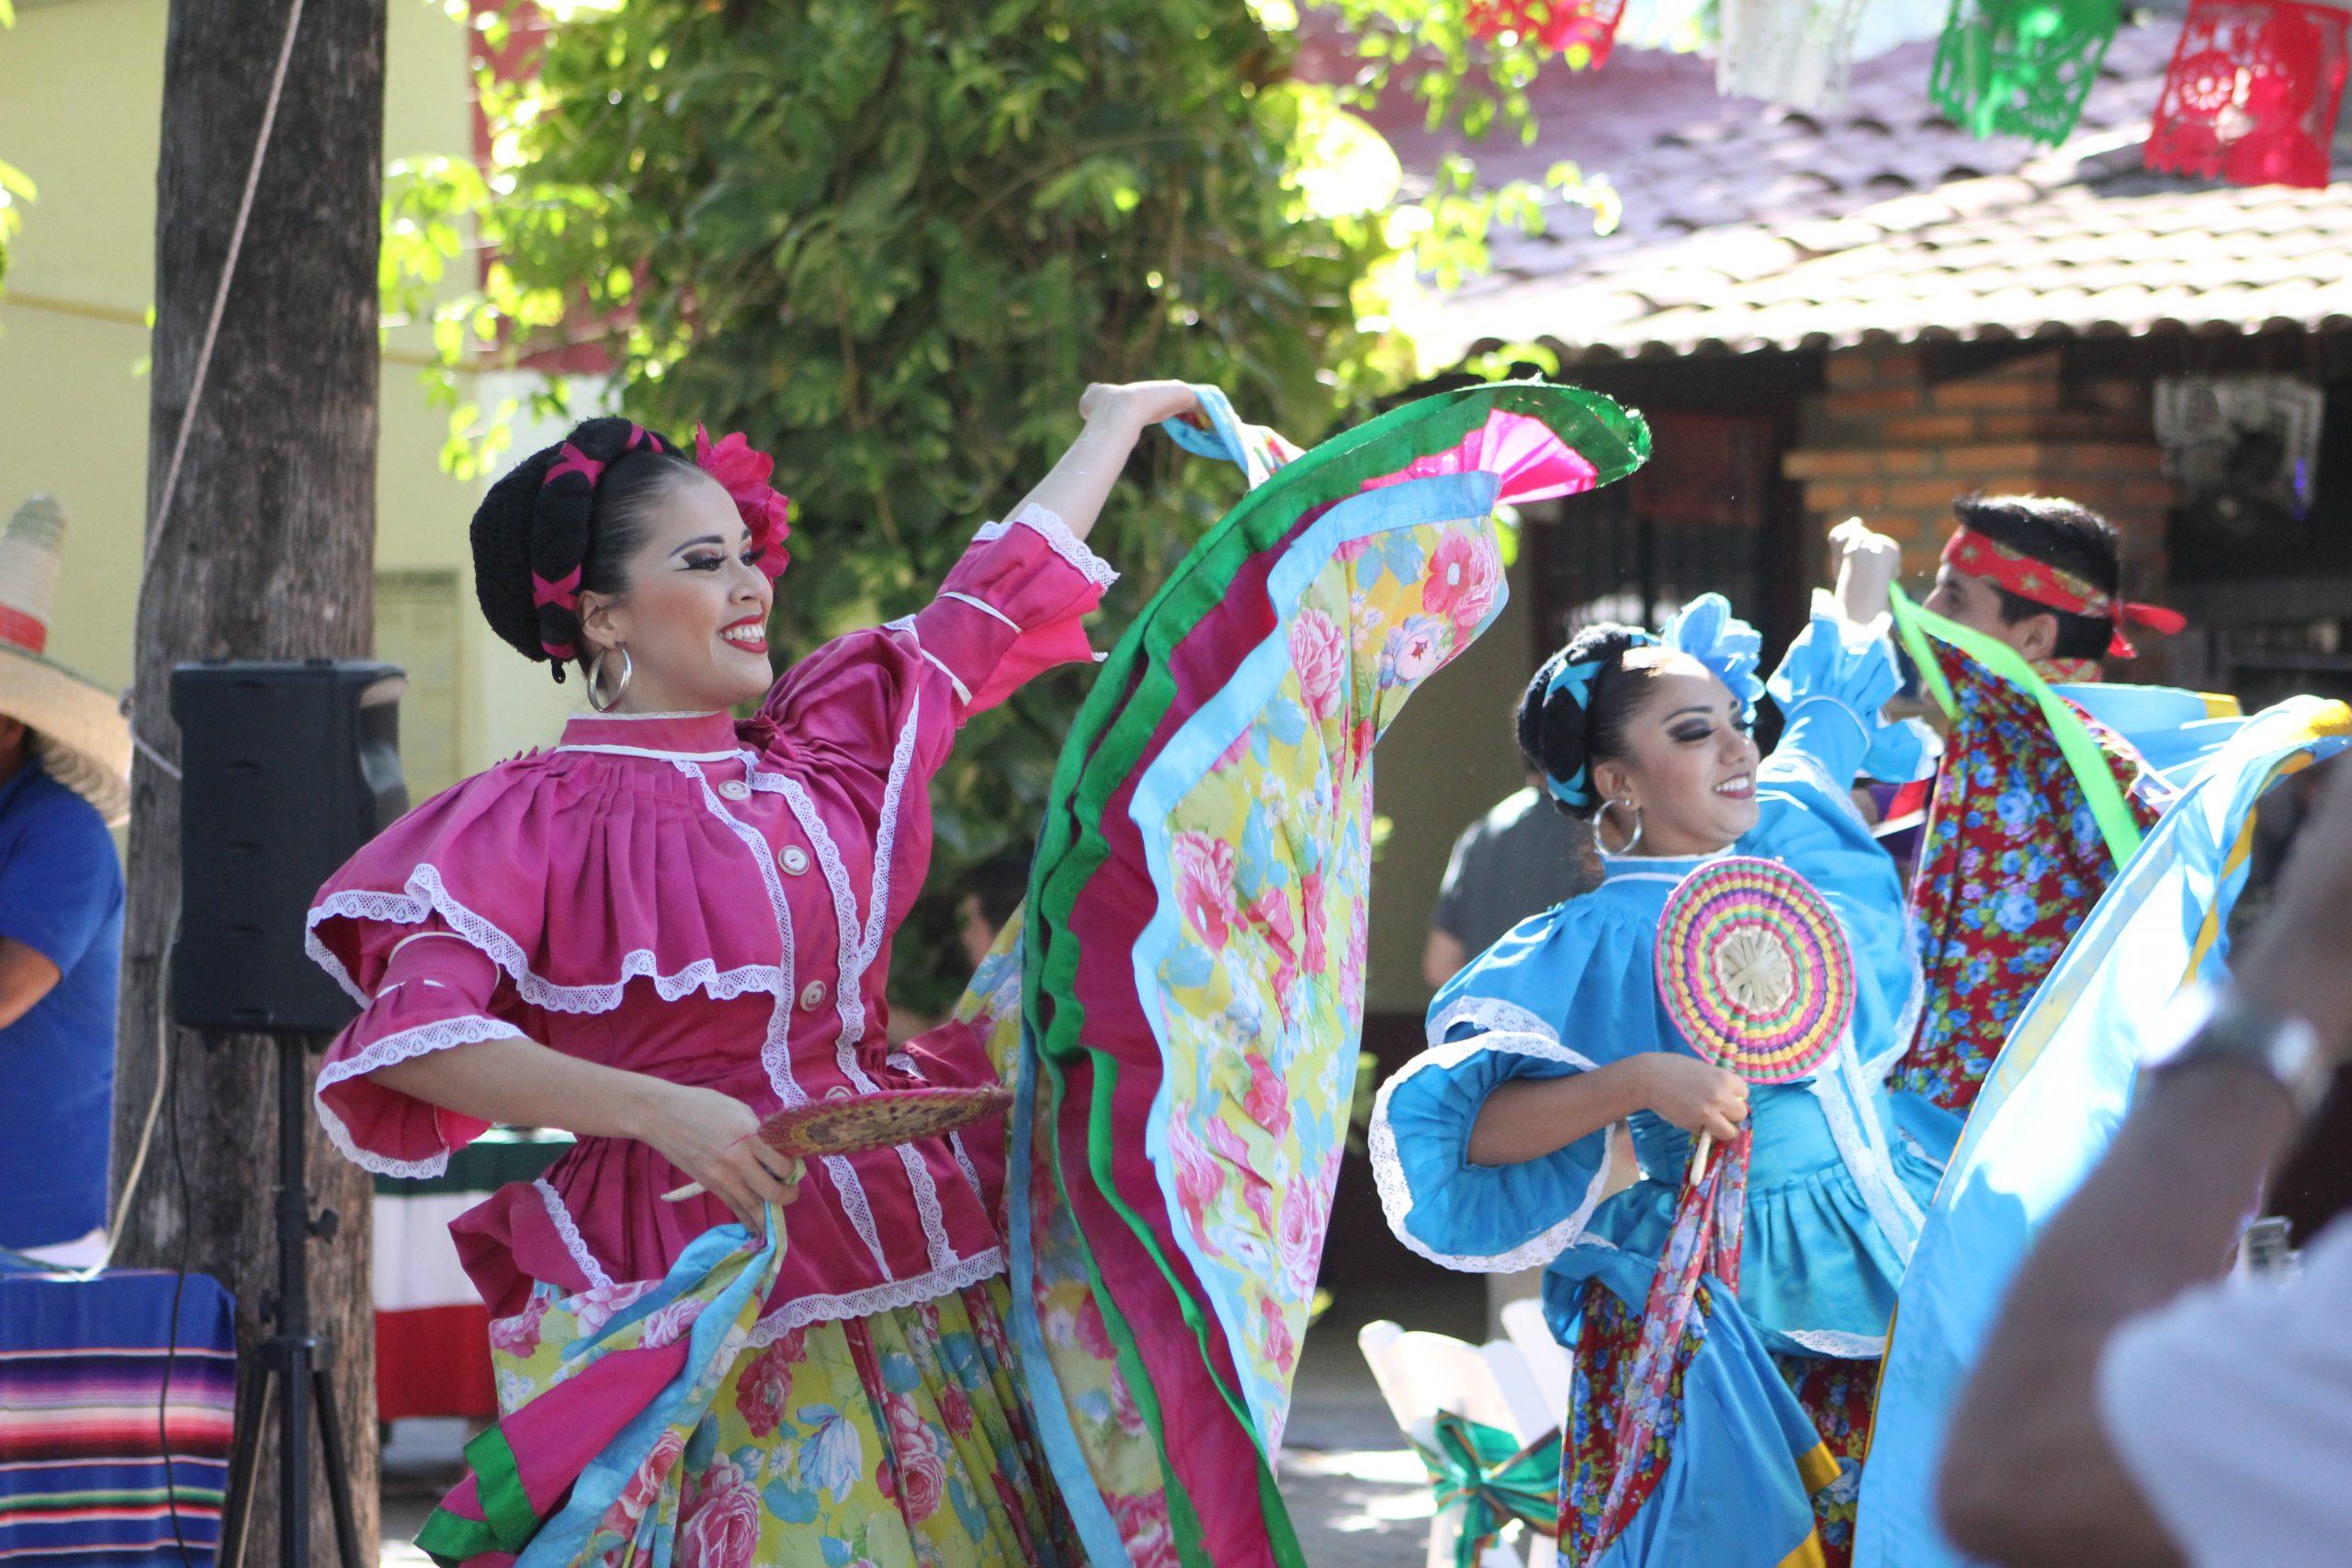 Mexican show in Hacienda Doña Engracia